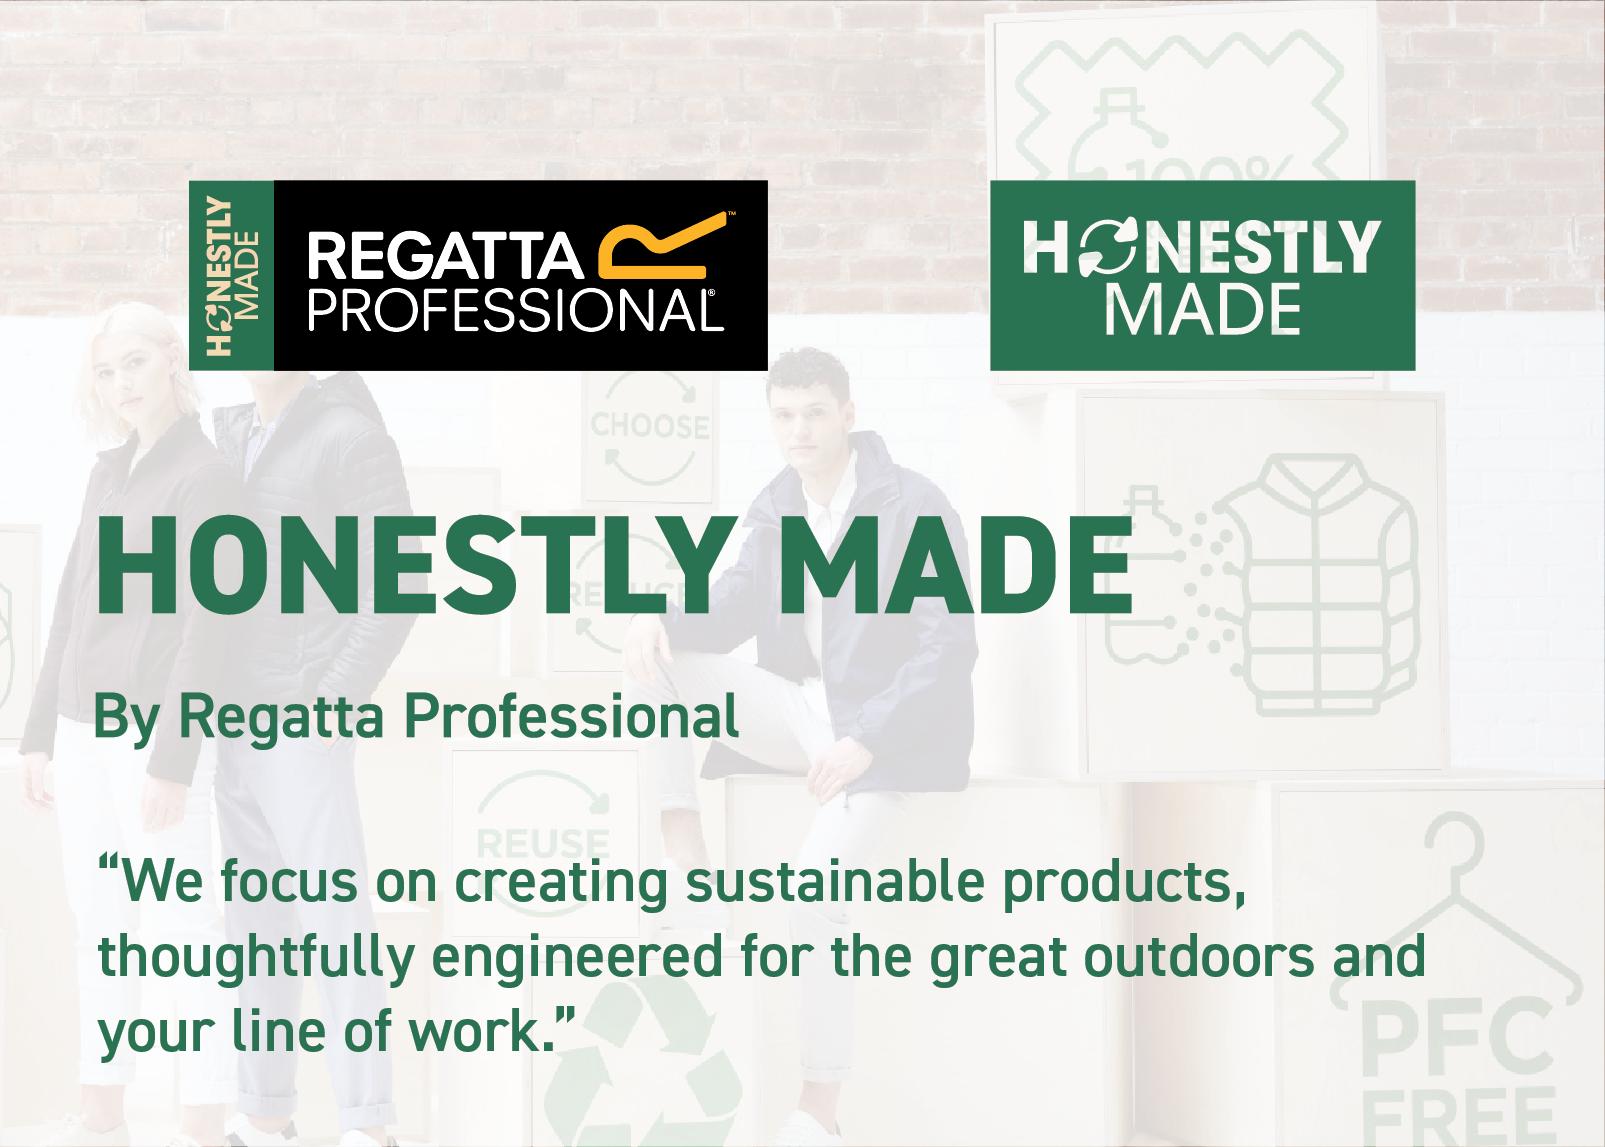 Regatta Professional Honestly Made